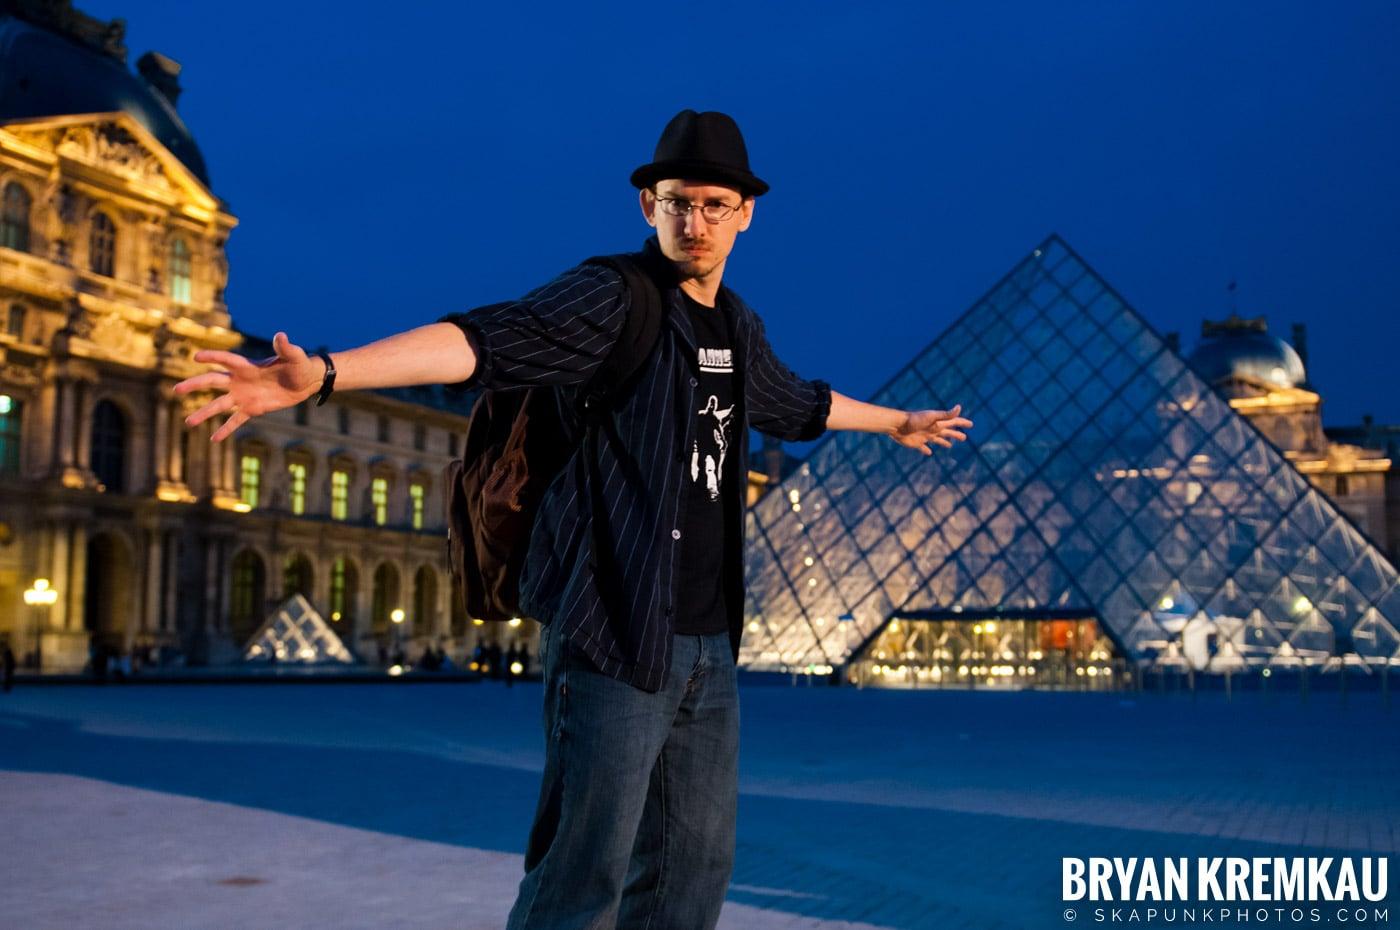 Paris, France Honeymoon - Day 4 - 7.21.11 (90)